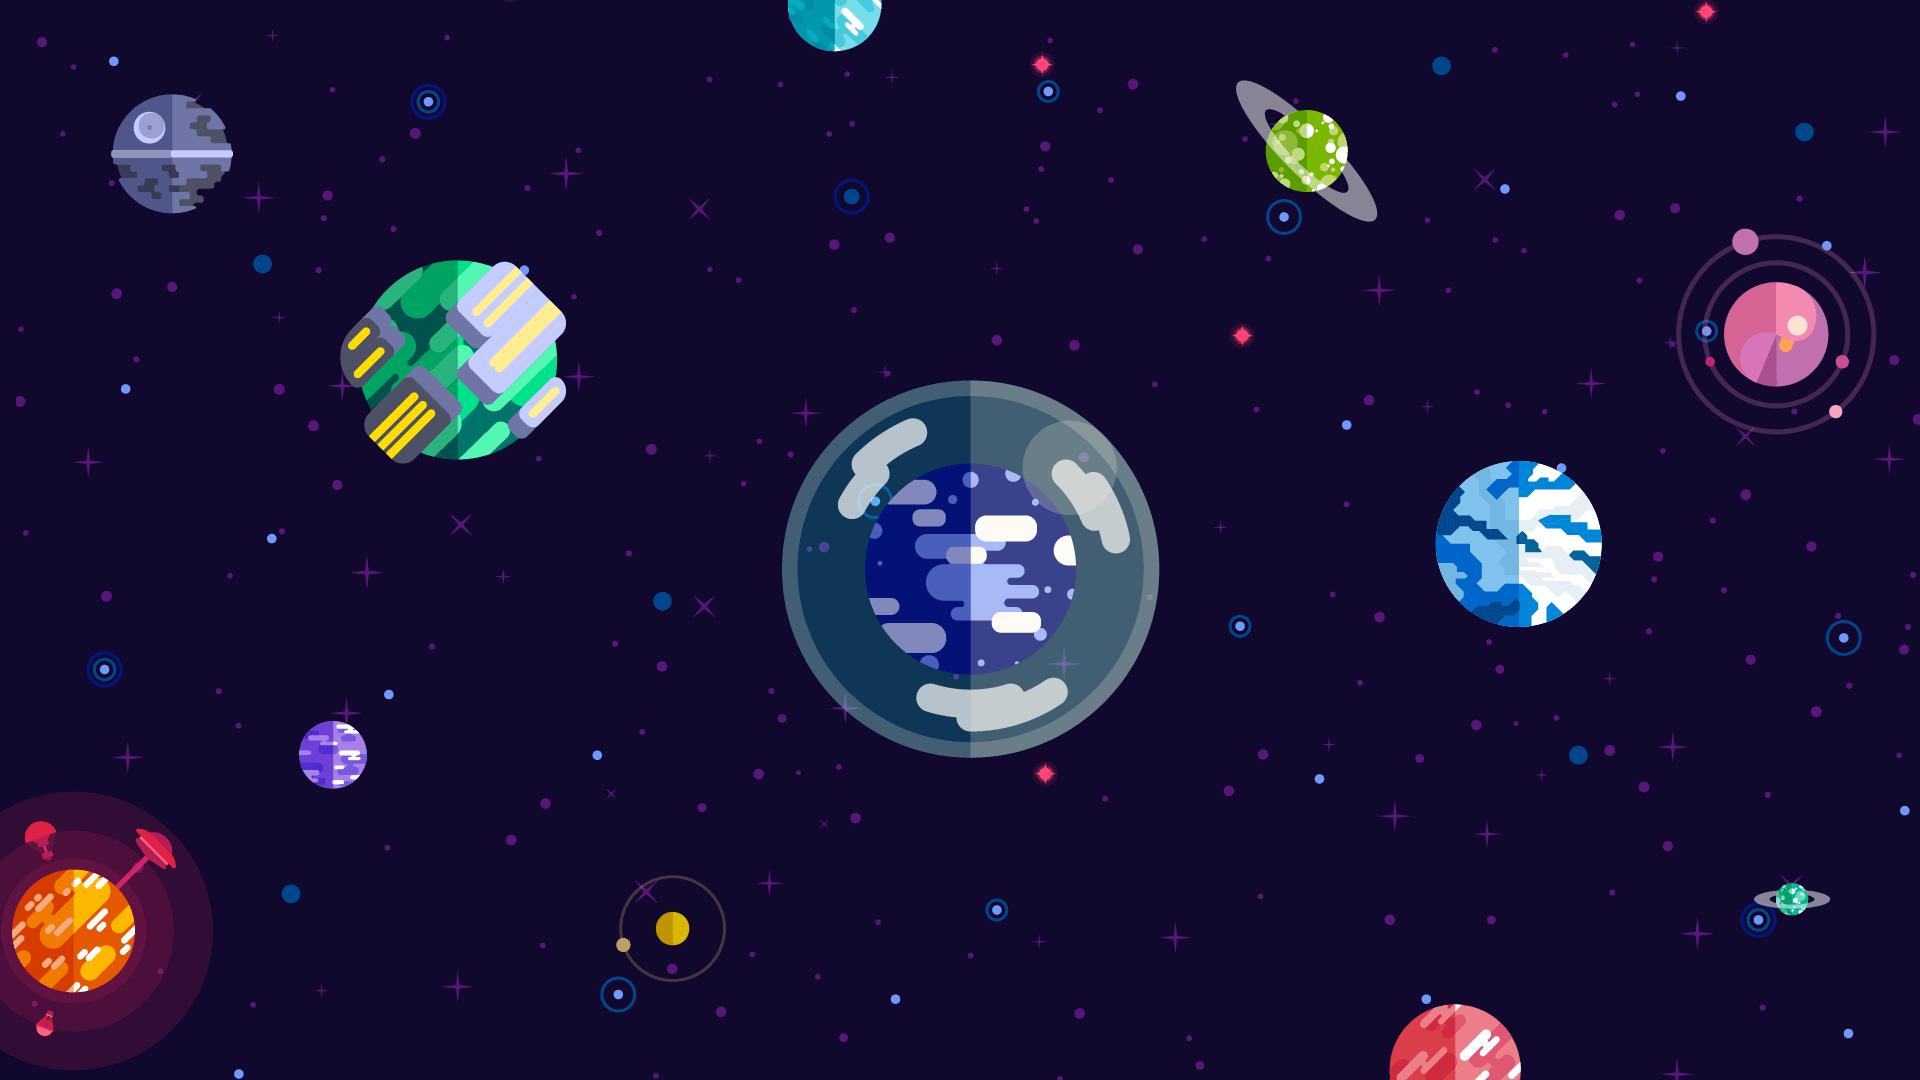 Pin By Fajar Nugroho On Flat Space In 2019 Macbook